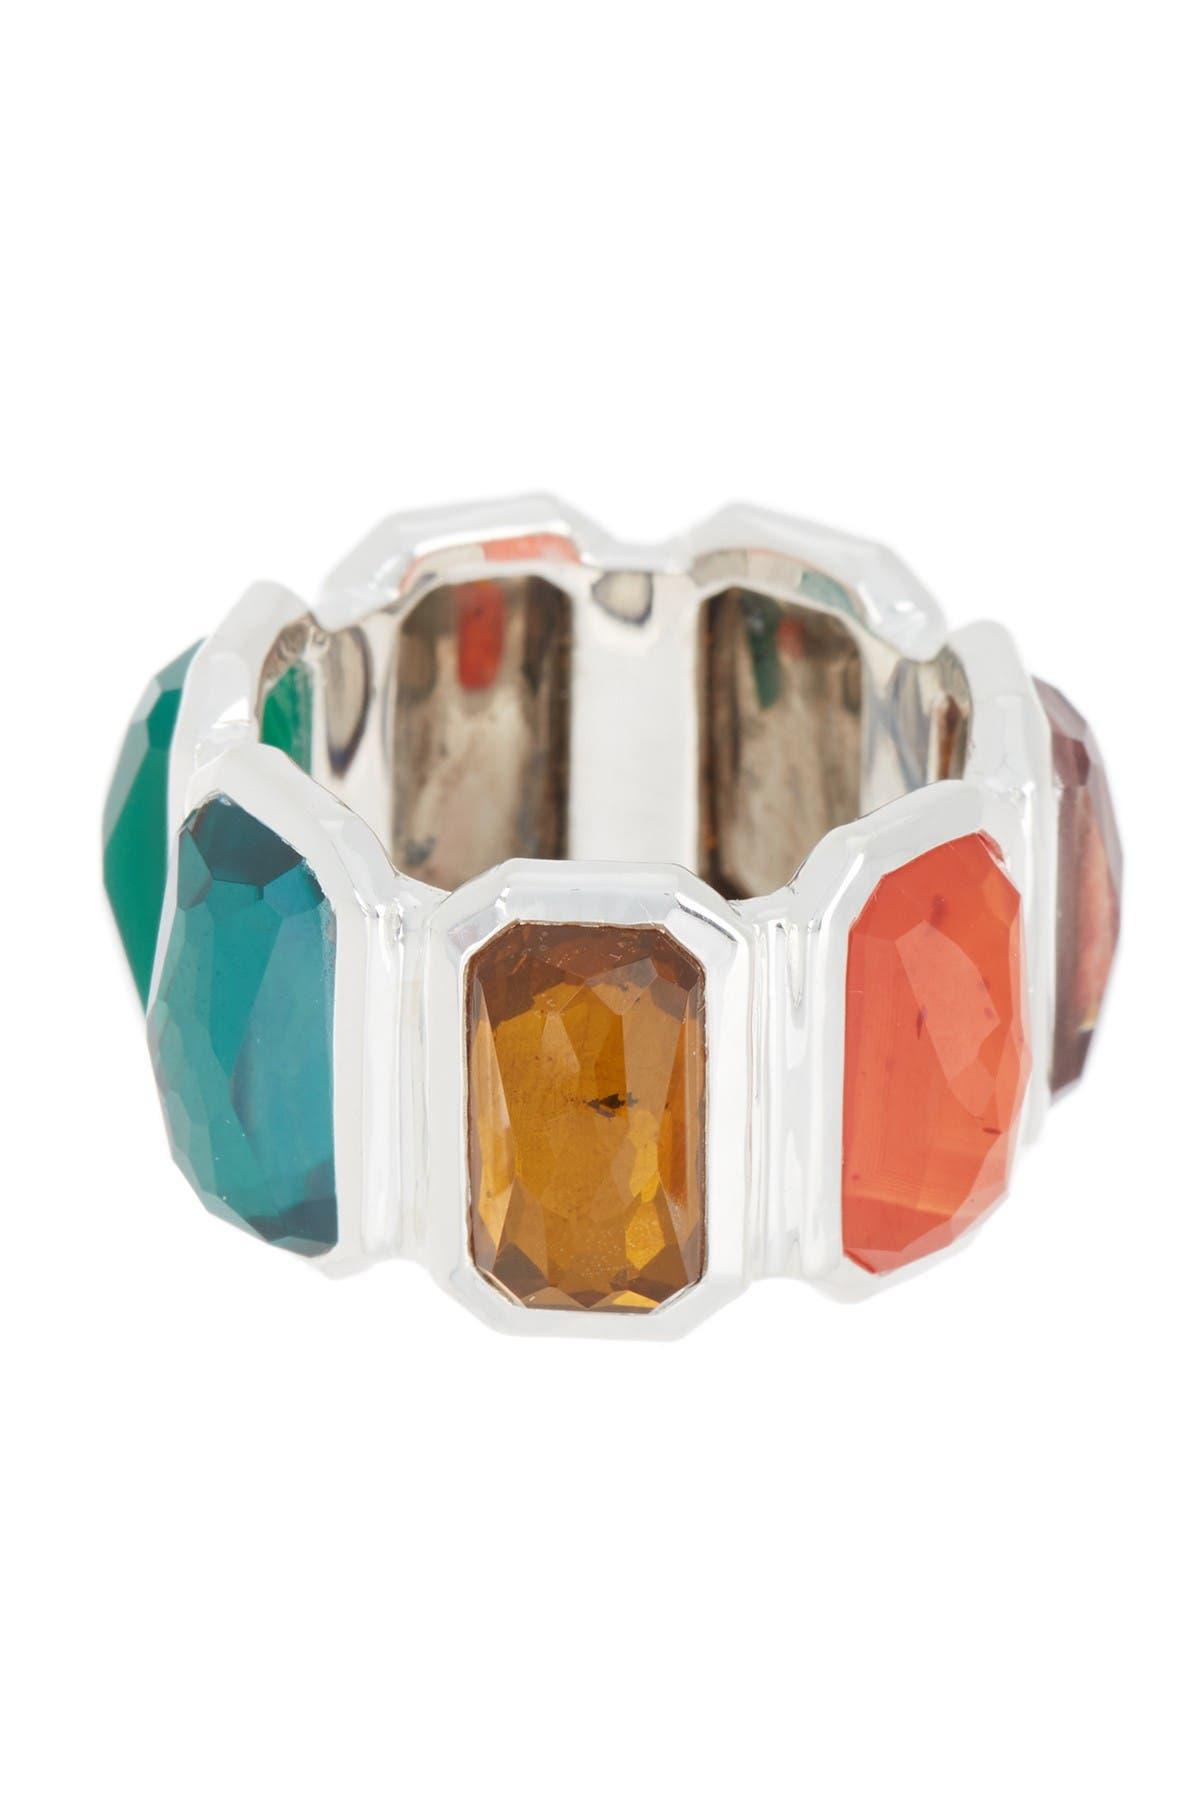 Image of Ippolita Sterling Silver Rock Candy® Wonderland Brick Ring in Metallic Rainbow